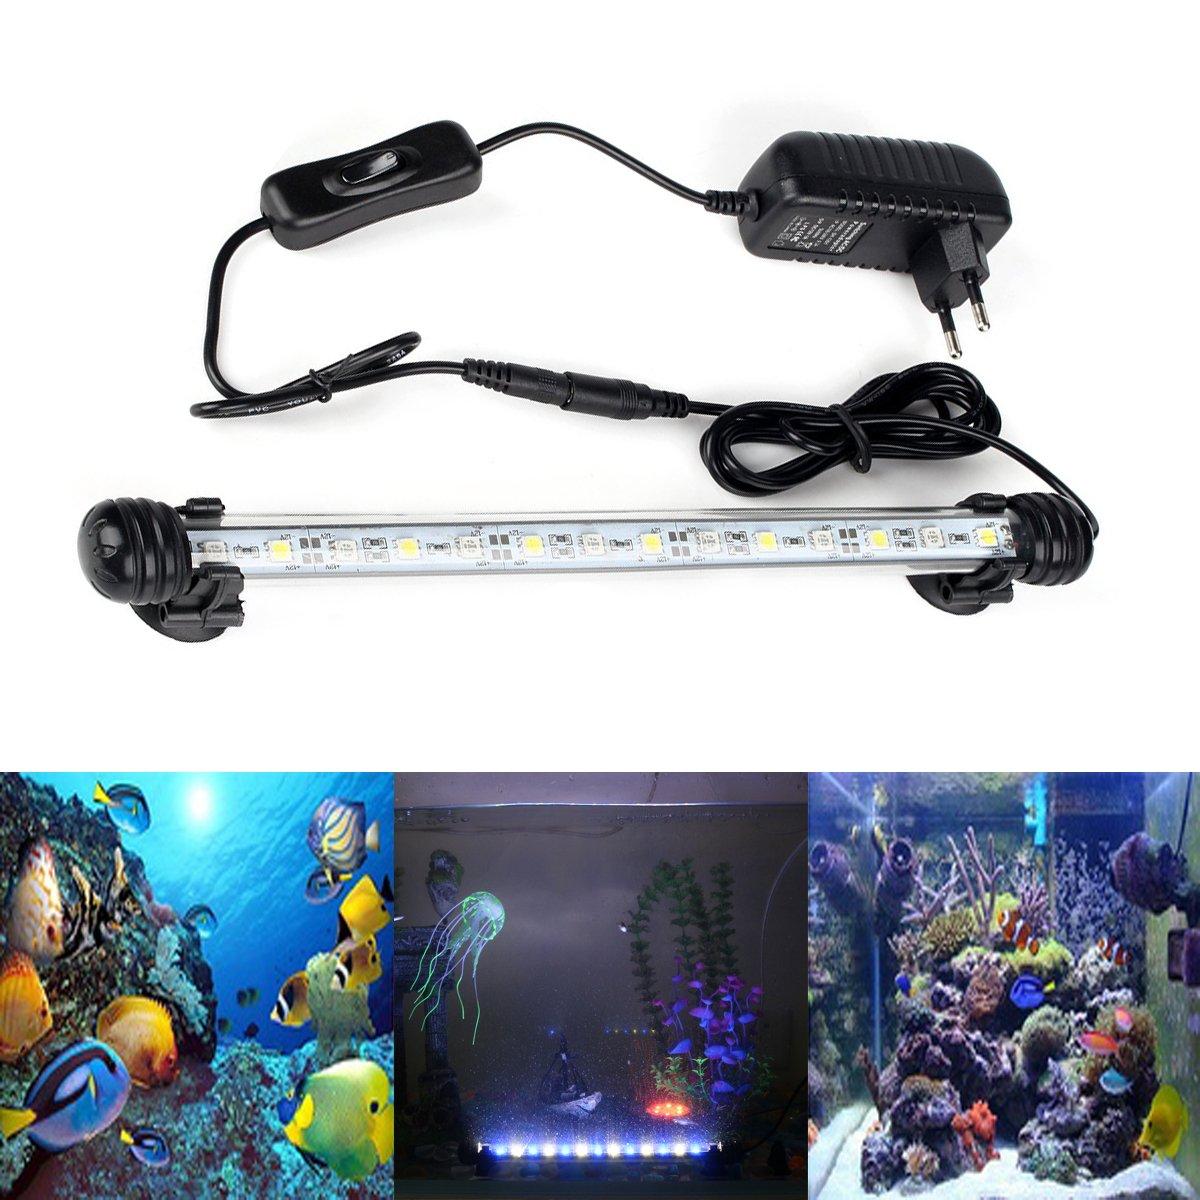 Aquarium Beleuchtung Steuerung   Greensun 38cm Aquarium Led Beleuchtung 16 Farb Rgb Steuerung Leuchte